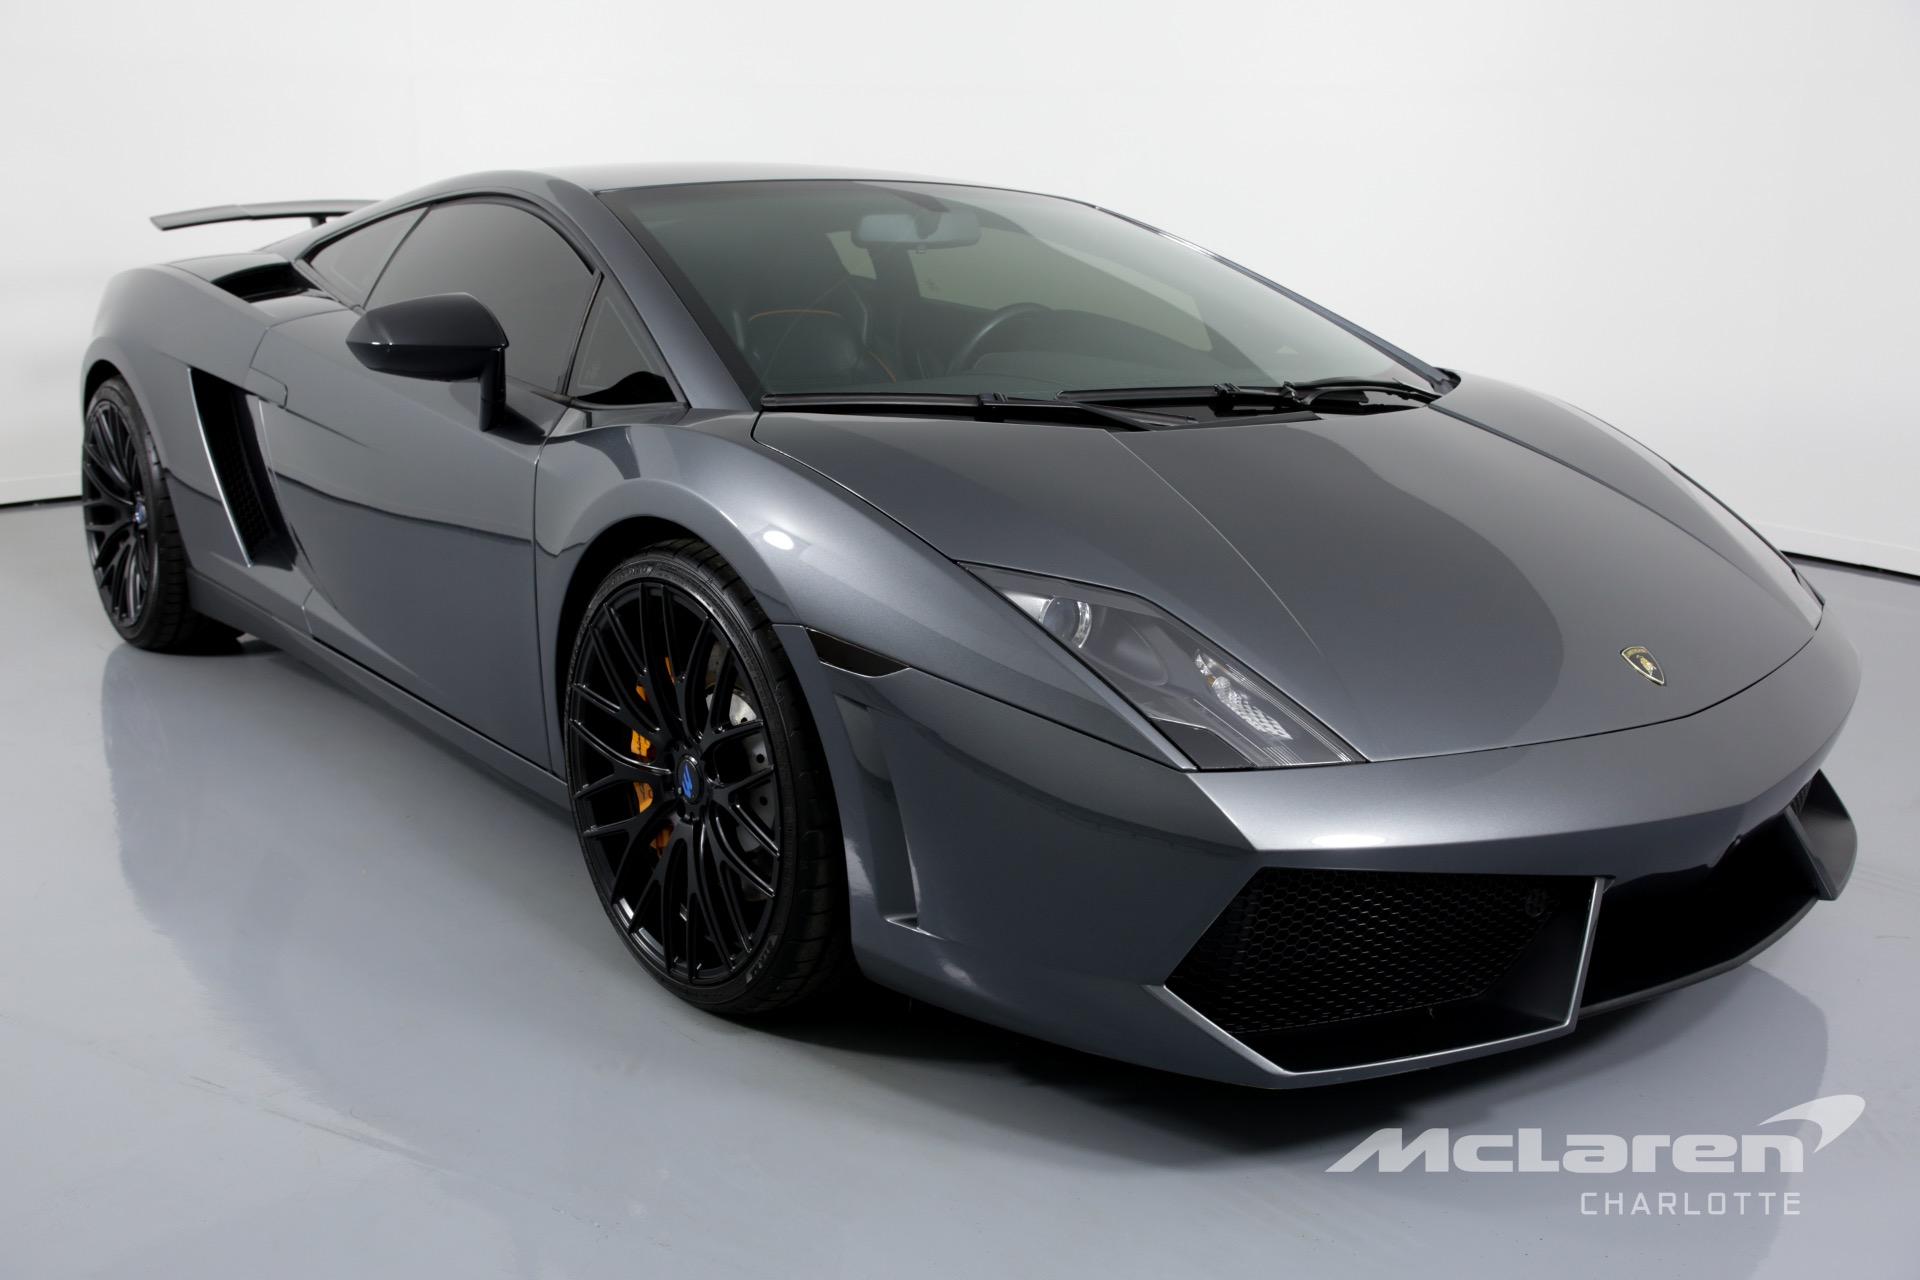 Used 2013 Lamborghini Gallardo Lp 550 2 For Sale 122 456